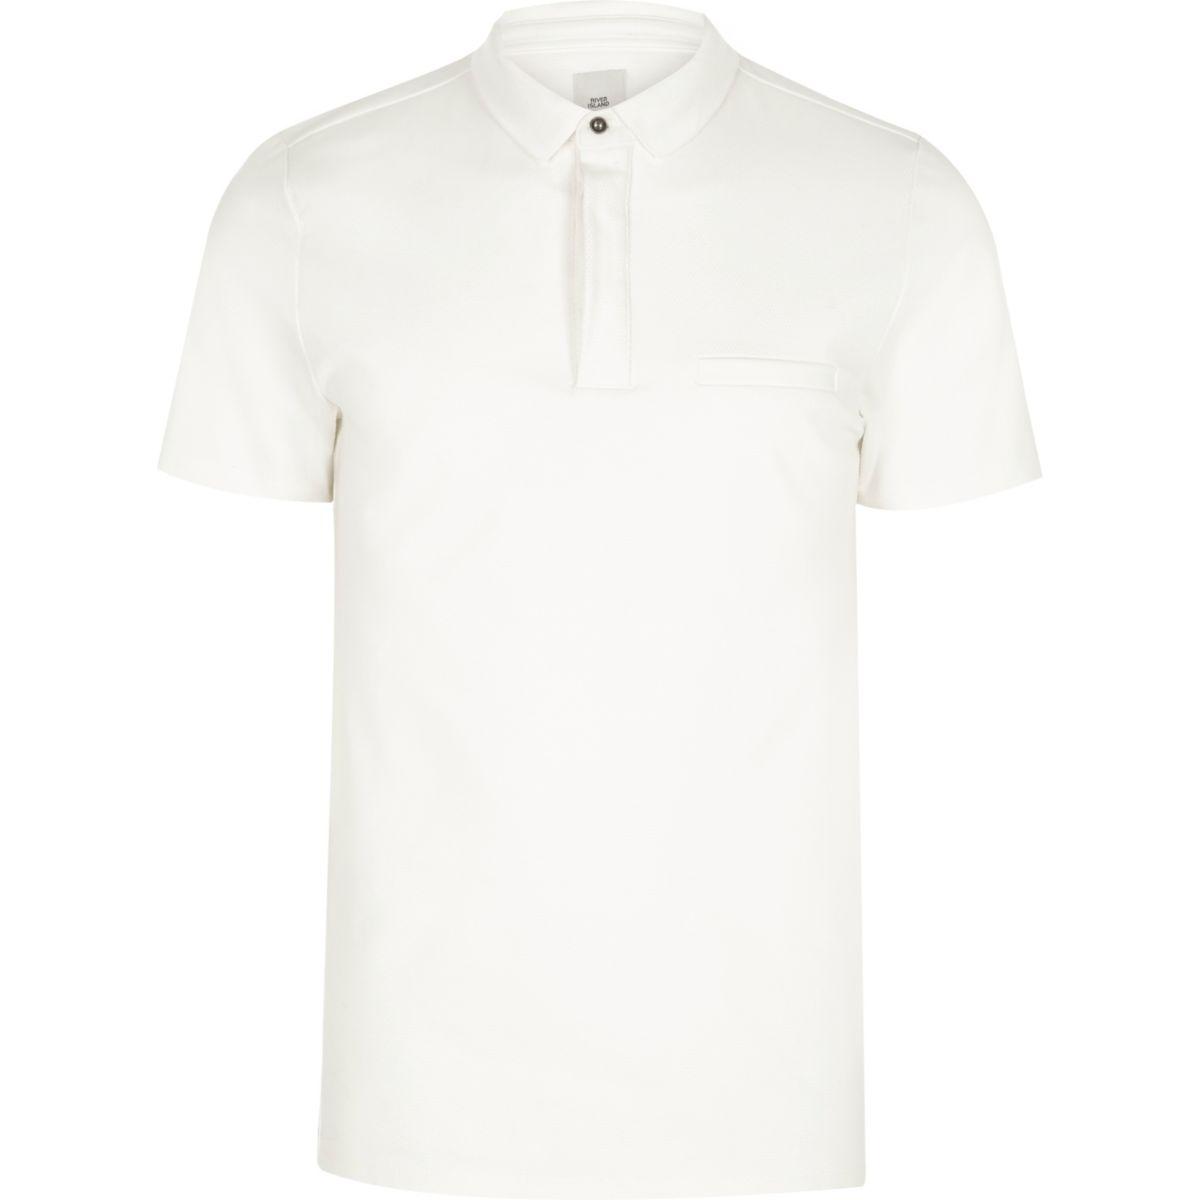 Cream slim fit short sleeve polo shirt